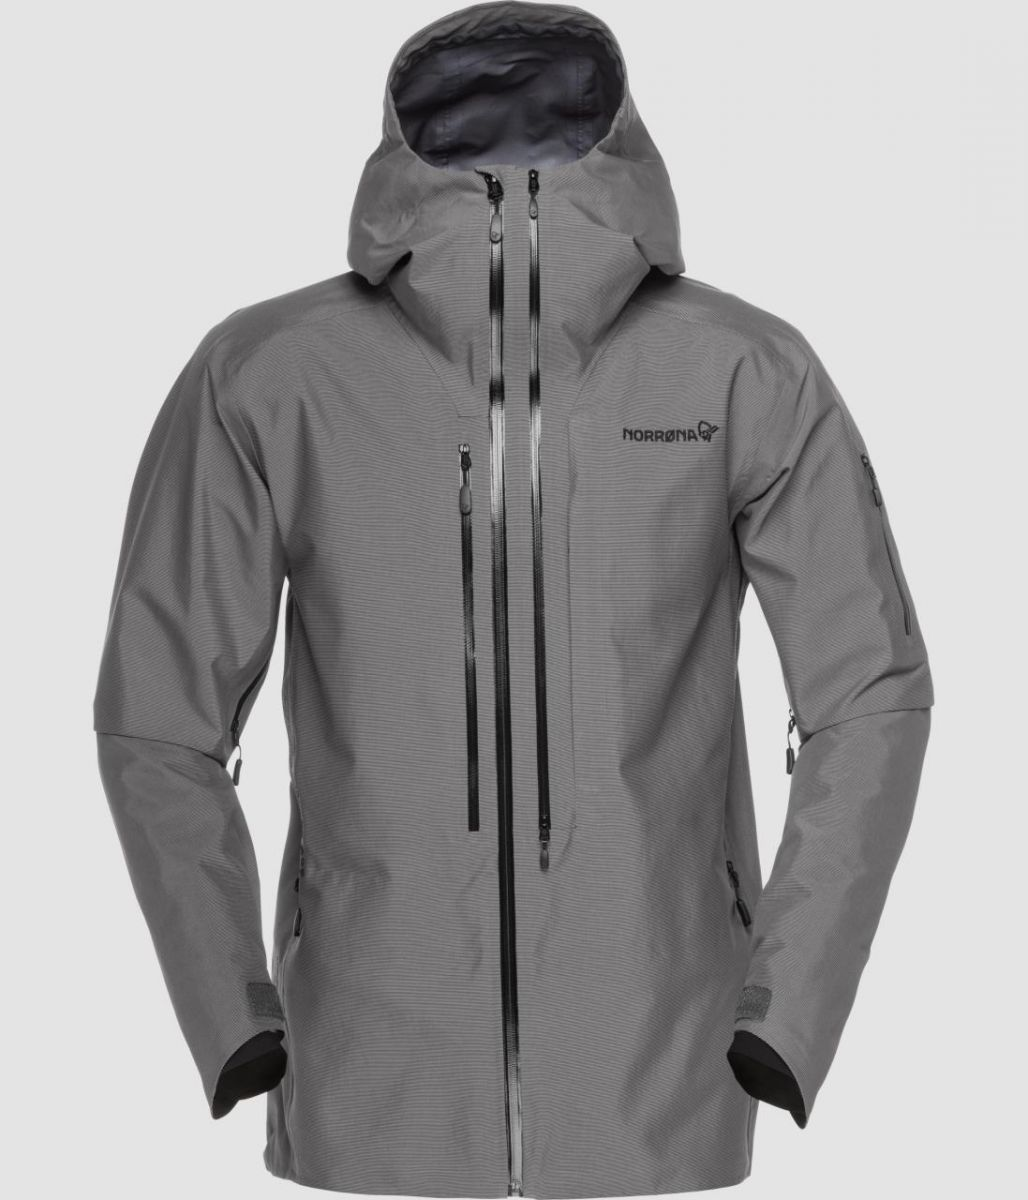 Norröna Lofoten ACE Gore-Tex Pro Jacket (M) Mercury